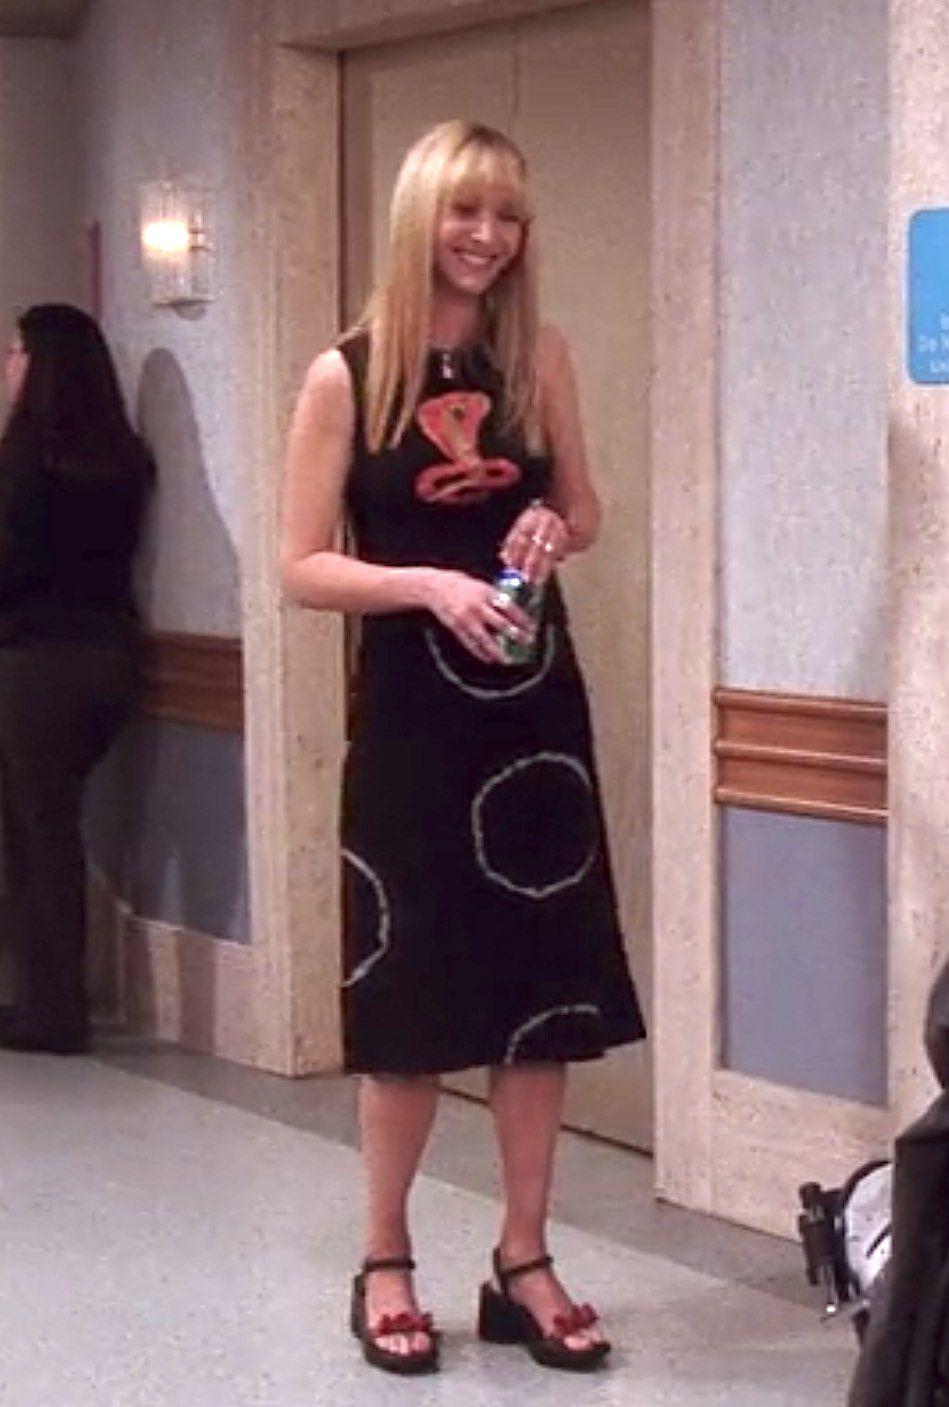 656 Outfits Phoebe Buffay Wore On Friends Fashion Paradoxes Phoebe Buffay Outfits Fashion Friends Fashion [ 1407 x 949 Pixel ]